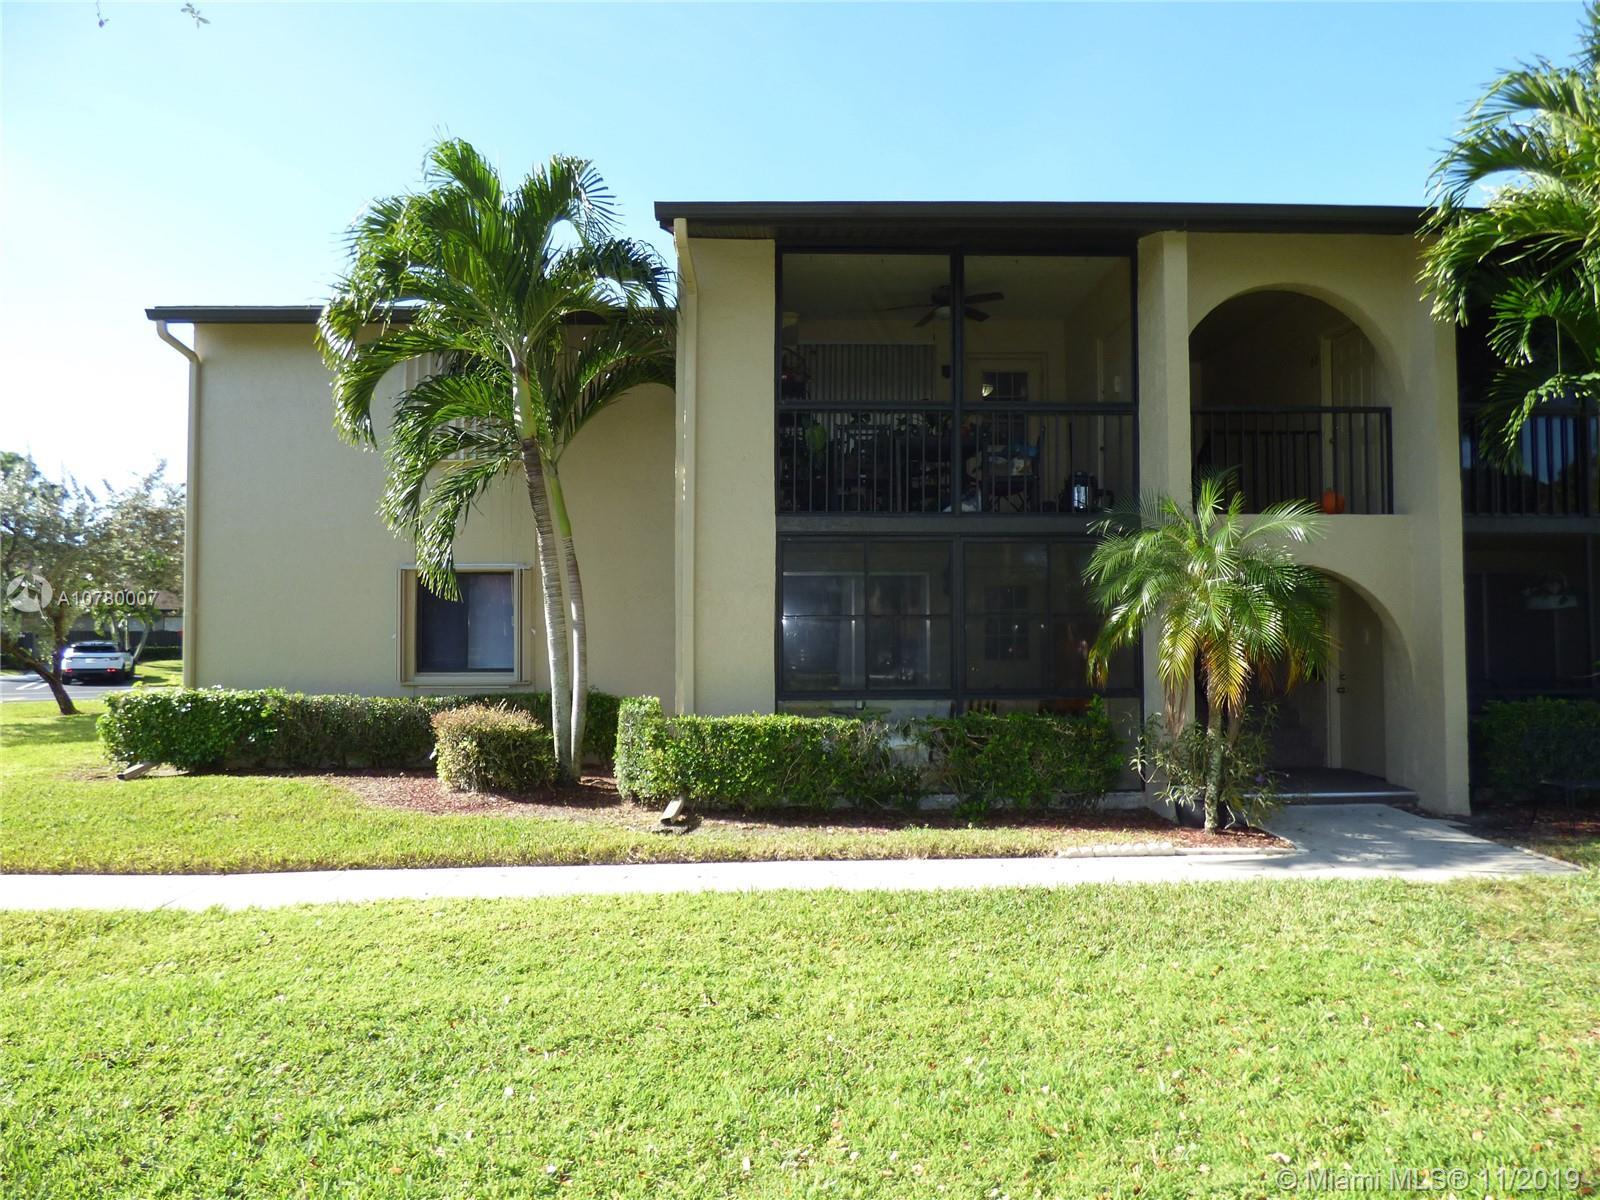 539 Shady Pine Way C1, Green Acres, FL 33415